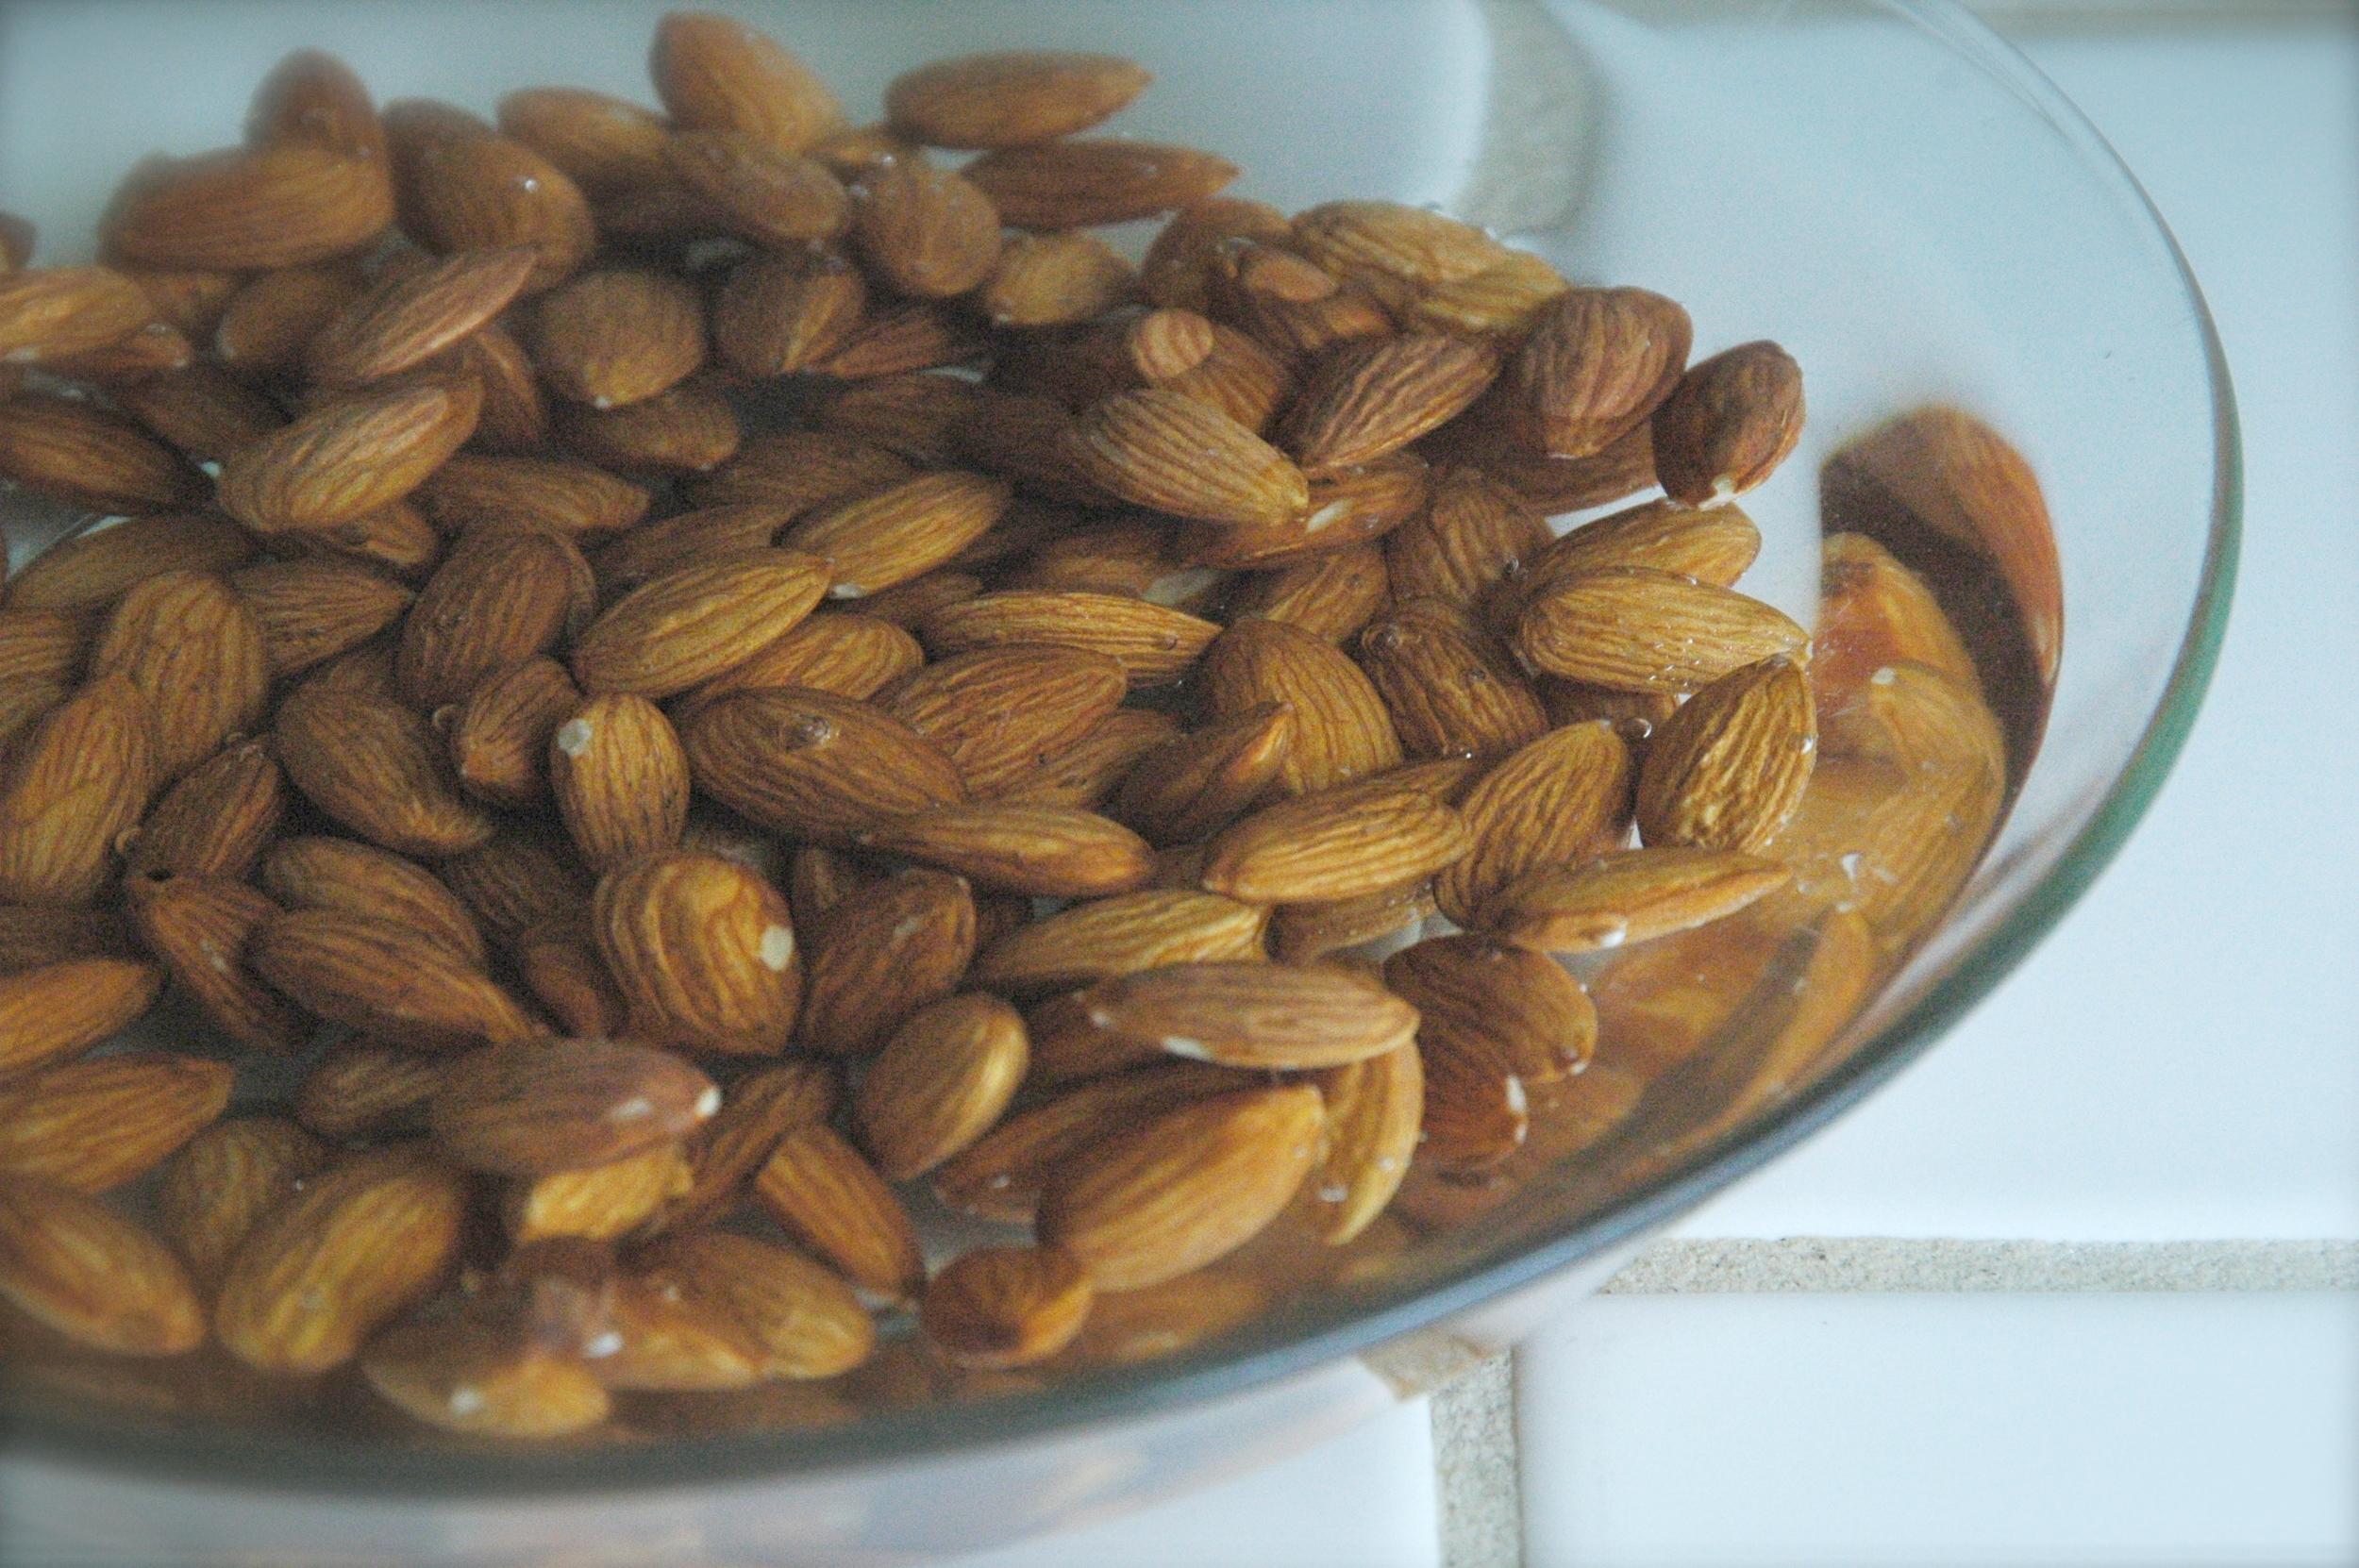 soaking almonds